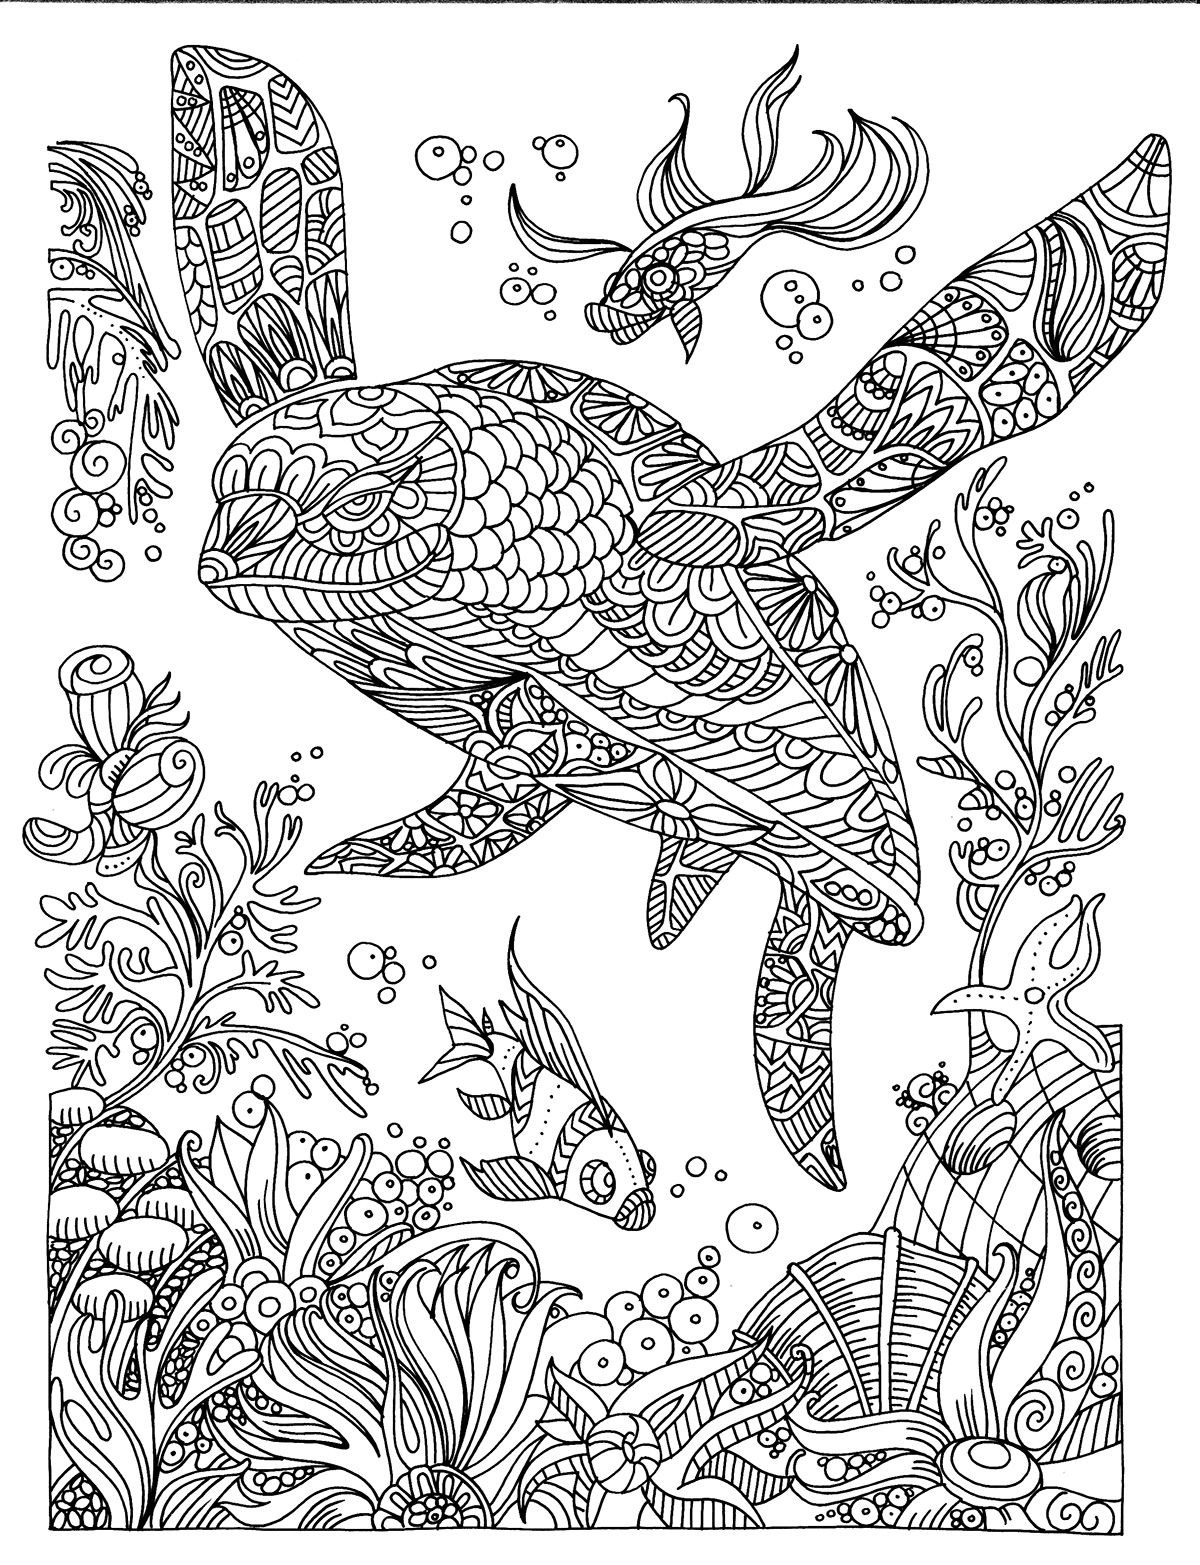 Turtle Illustration Colouring Page Mandalas Zentangle